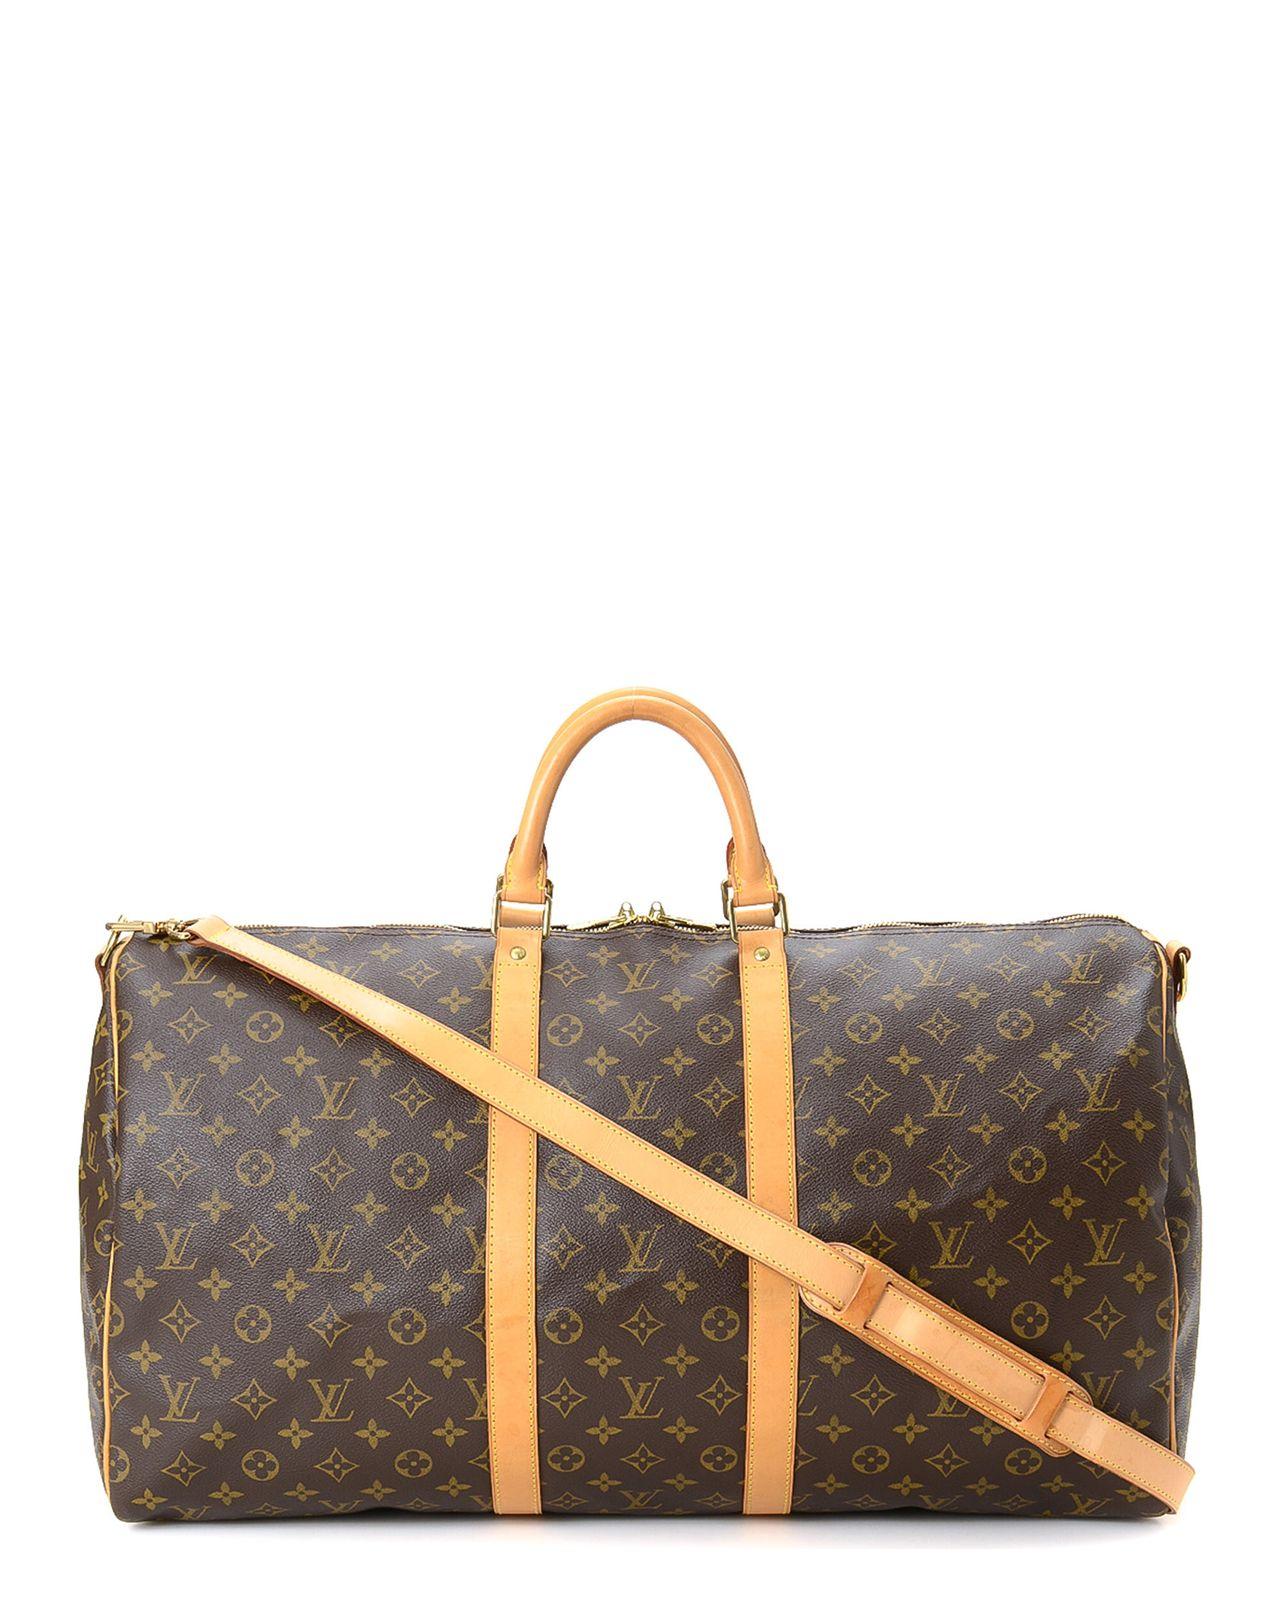 a7a8a1bb62 Louis Vuitton Keepall 55 Bandouliere Travel Bag - Vintage